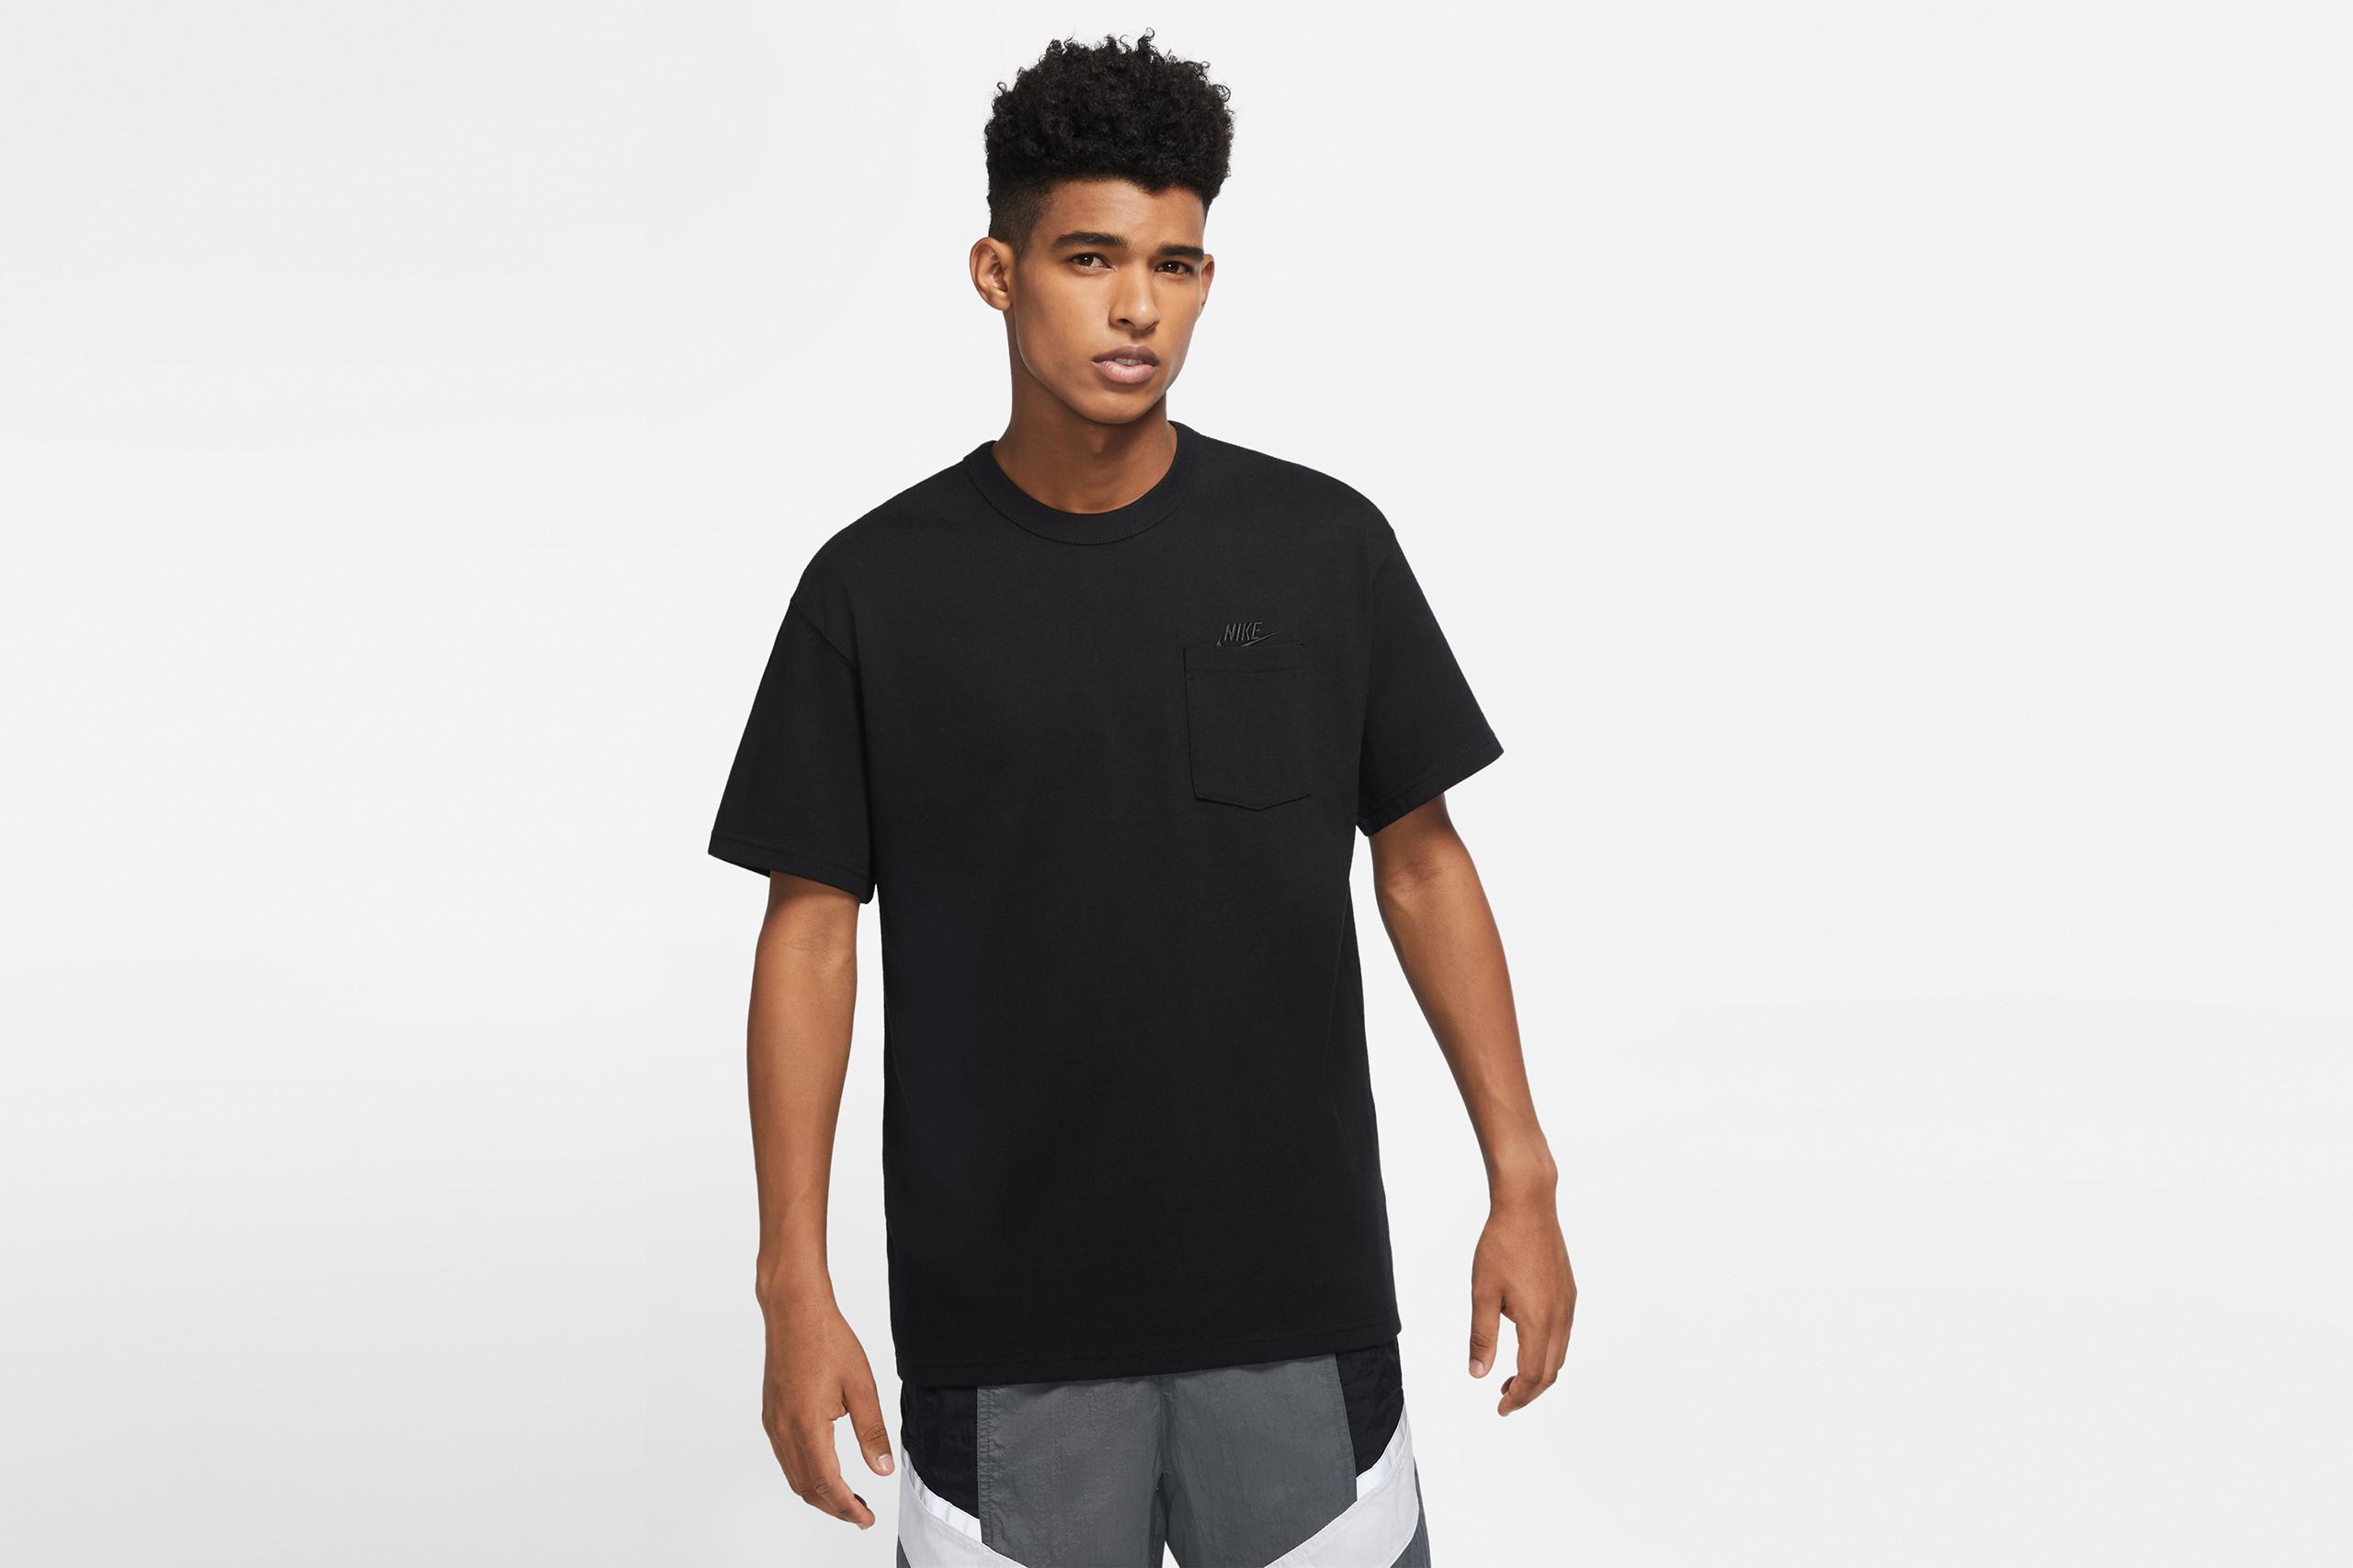 Nike Pocket T-Shirt Premium Essentials Black